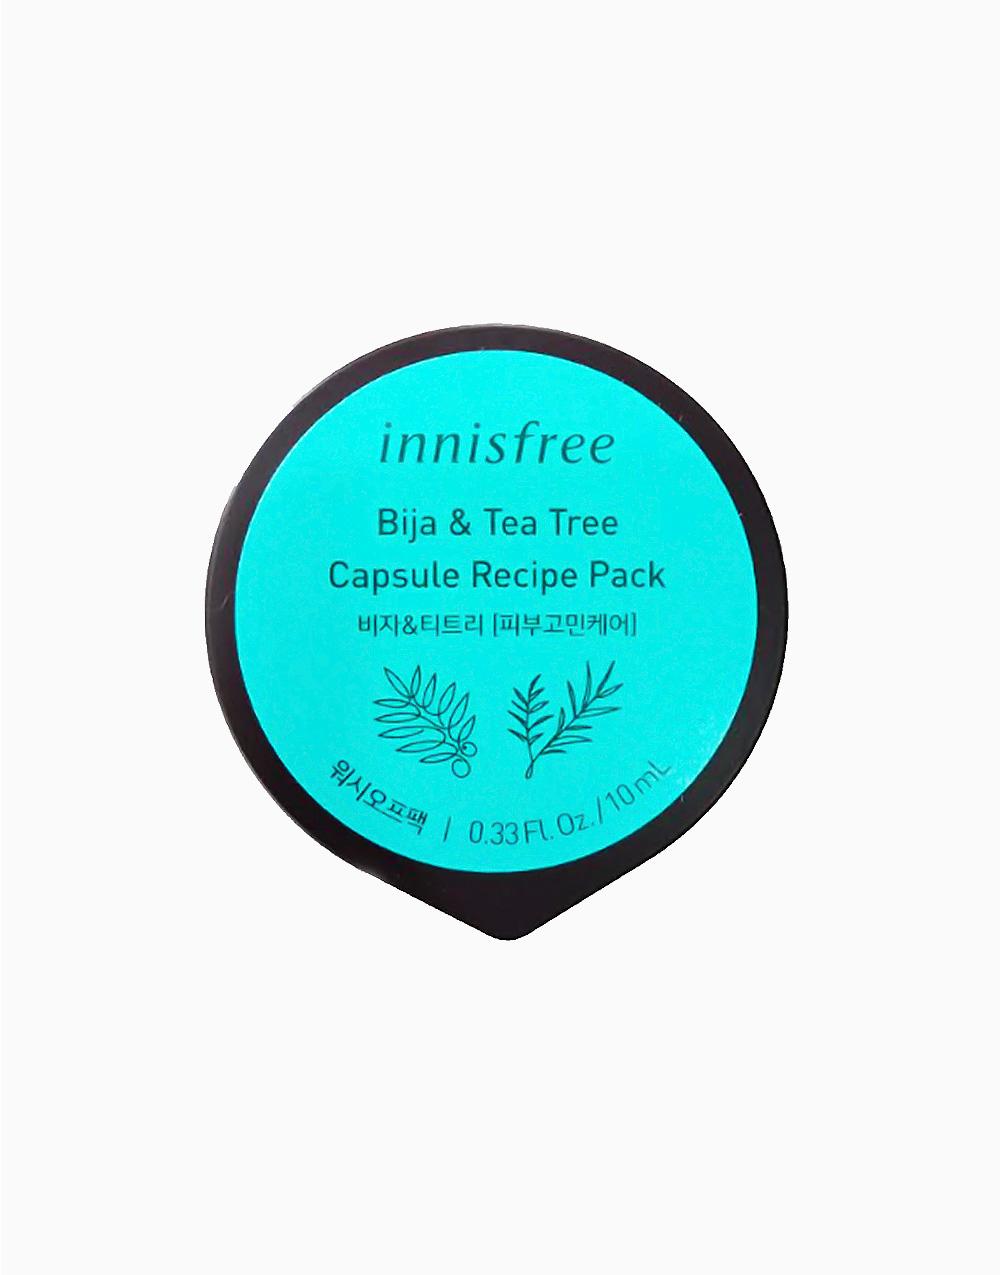 Bija & Tea Tree Capsule Recipe Pack by Innisfree